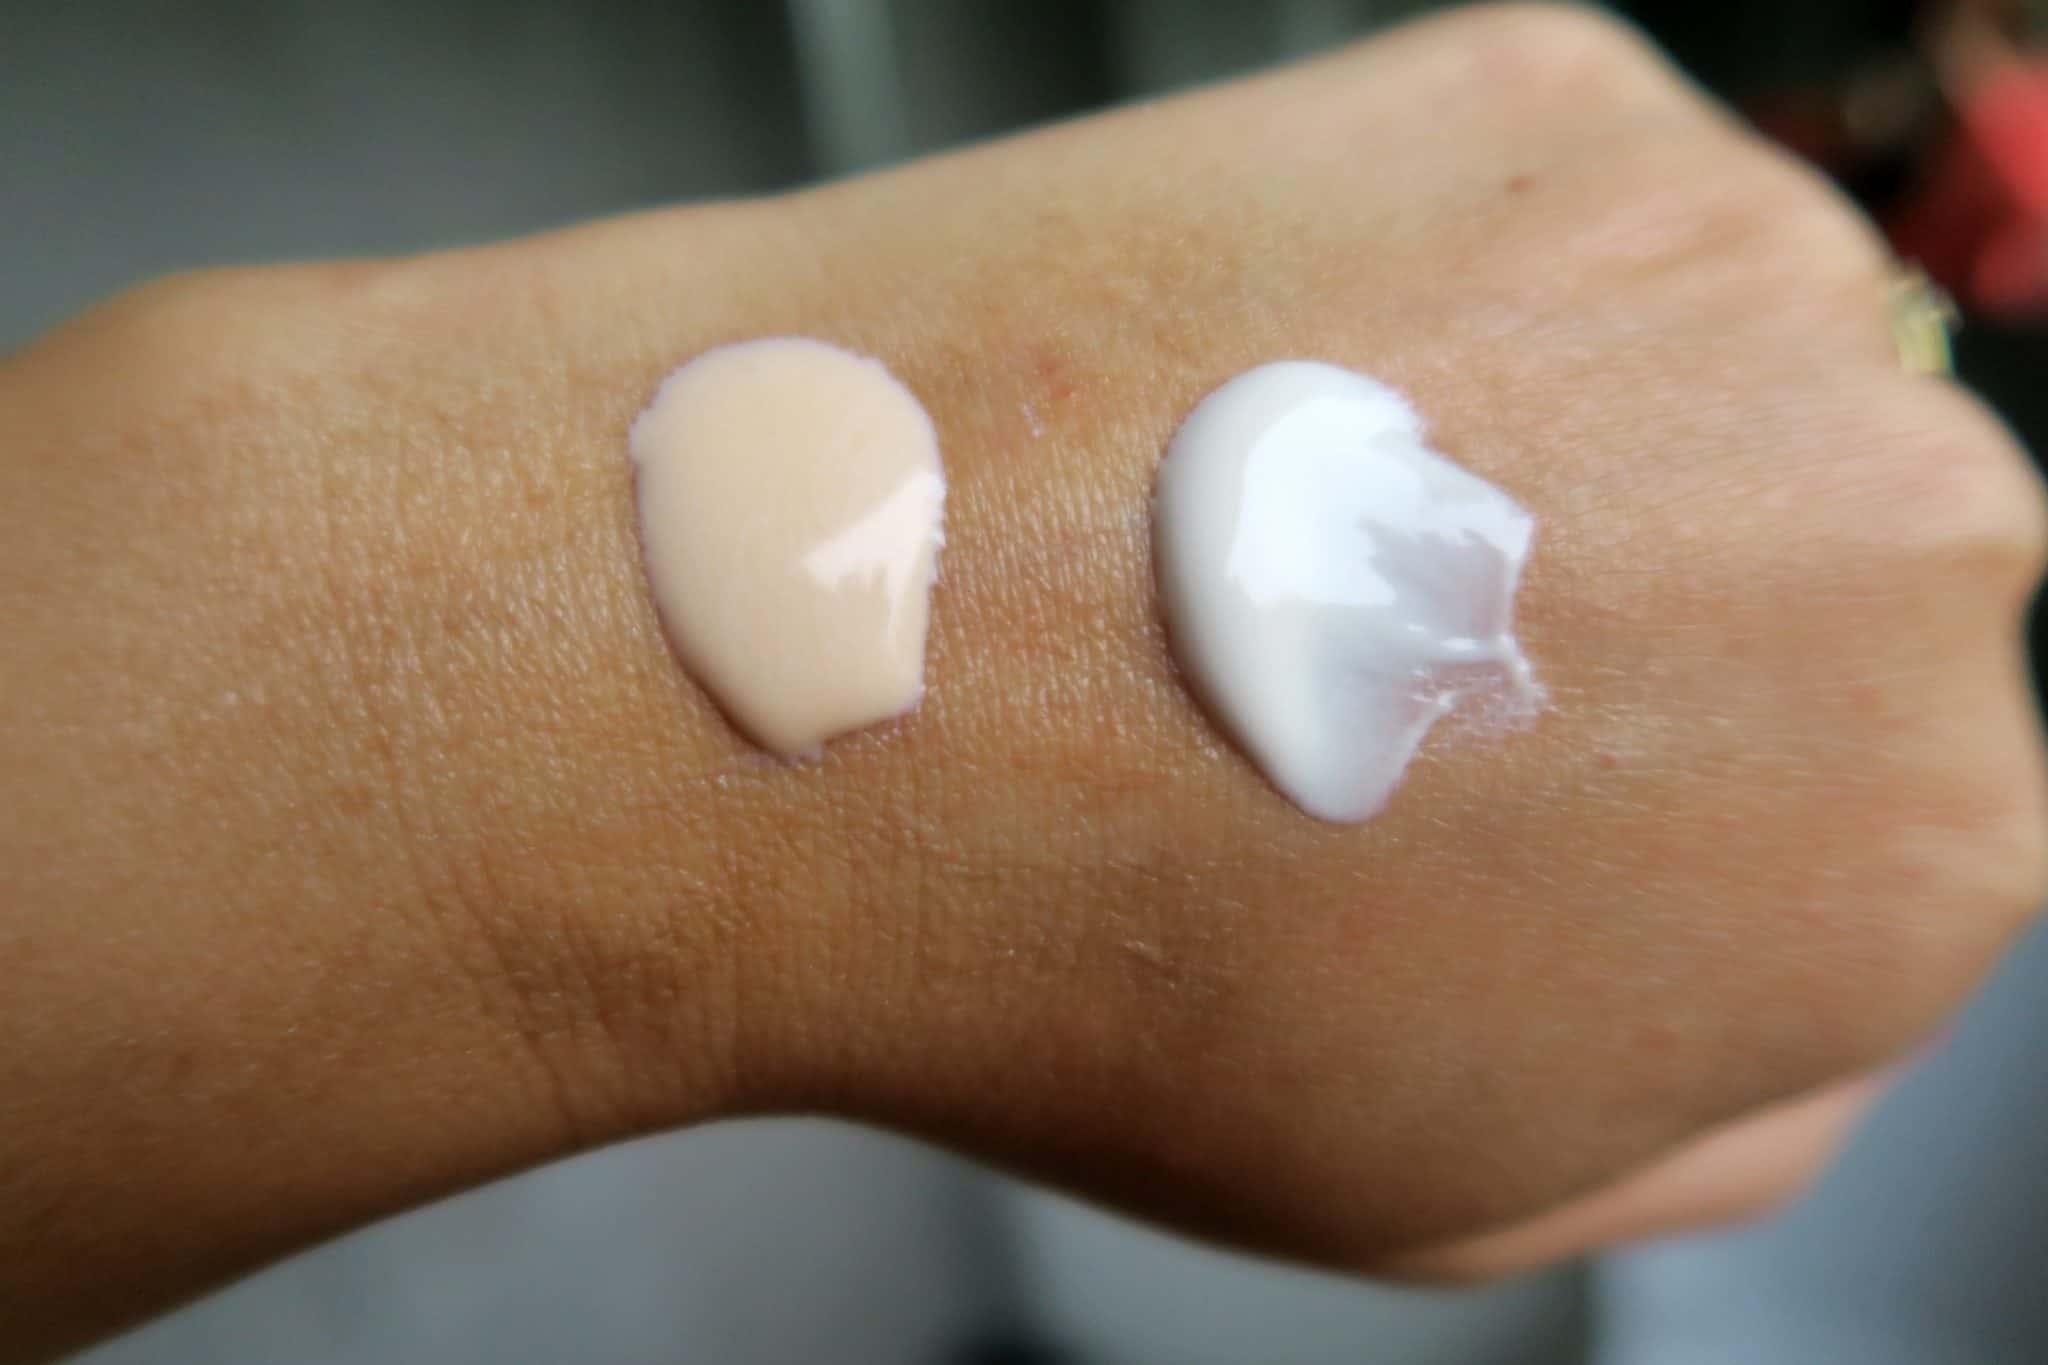 radiance balm and all bright moisturiser